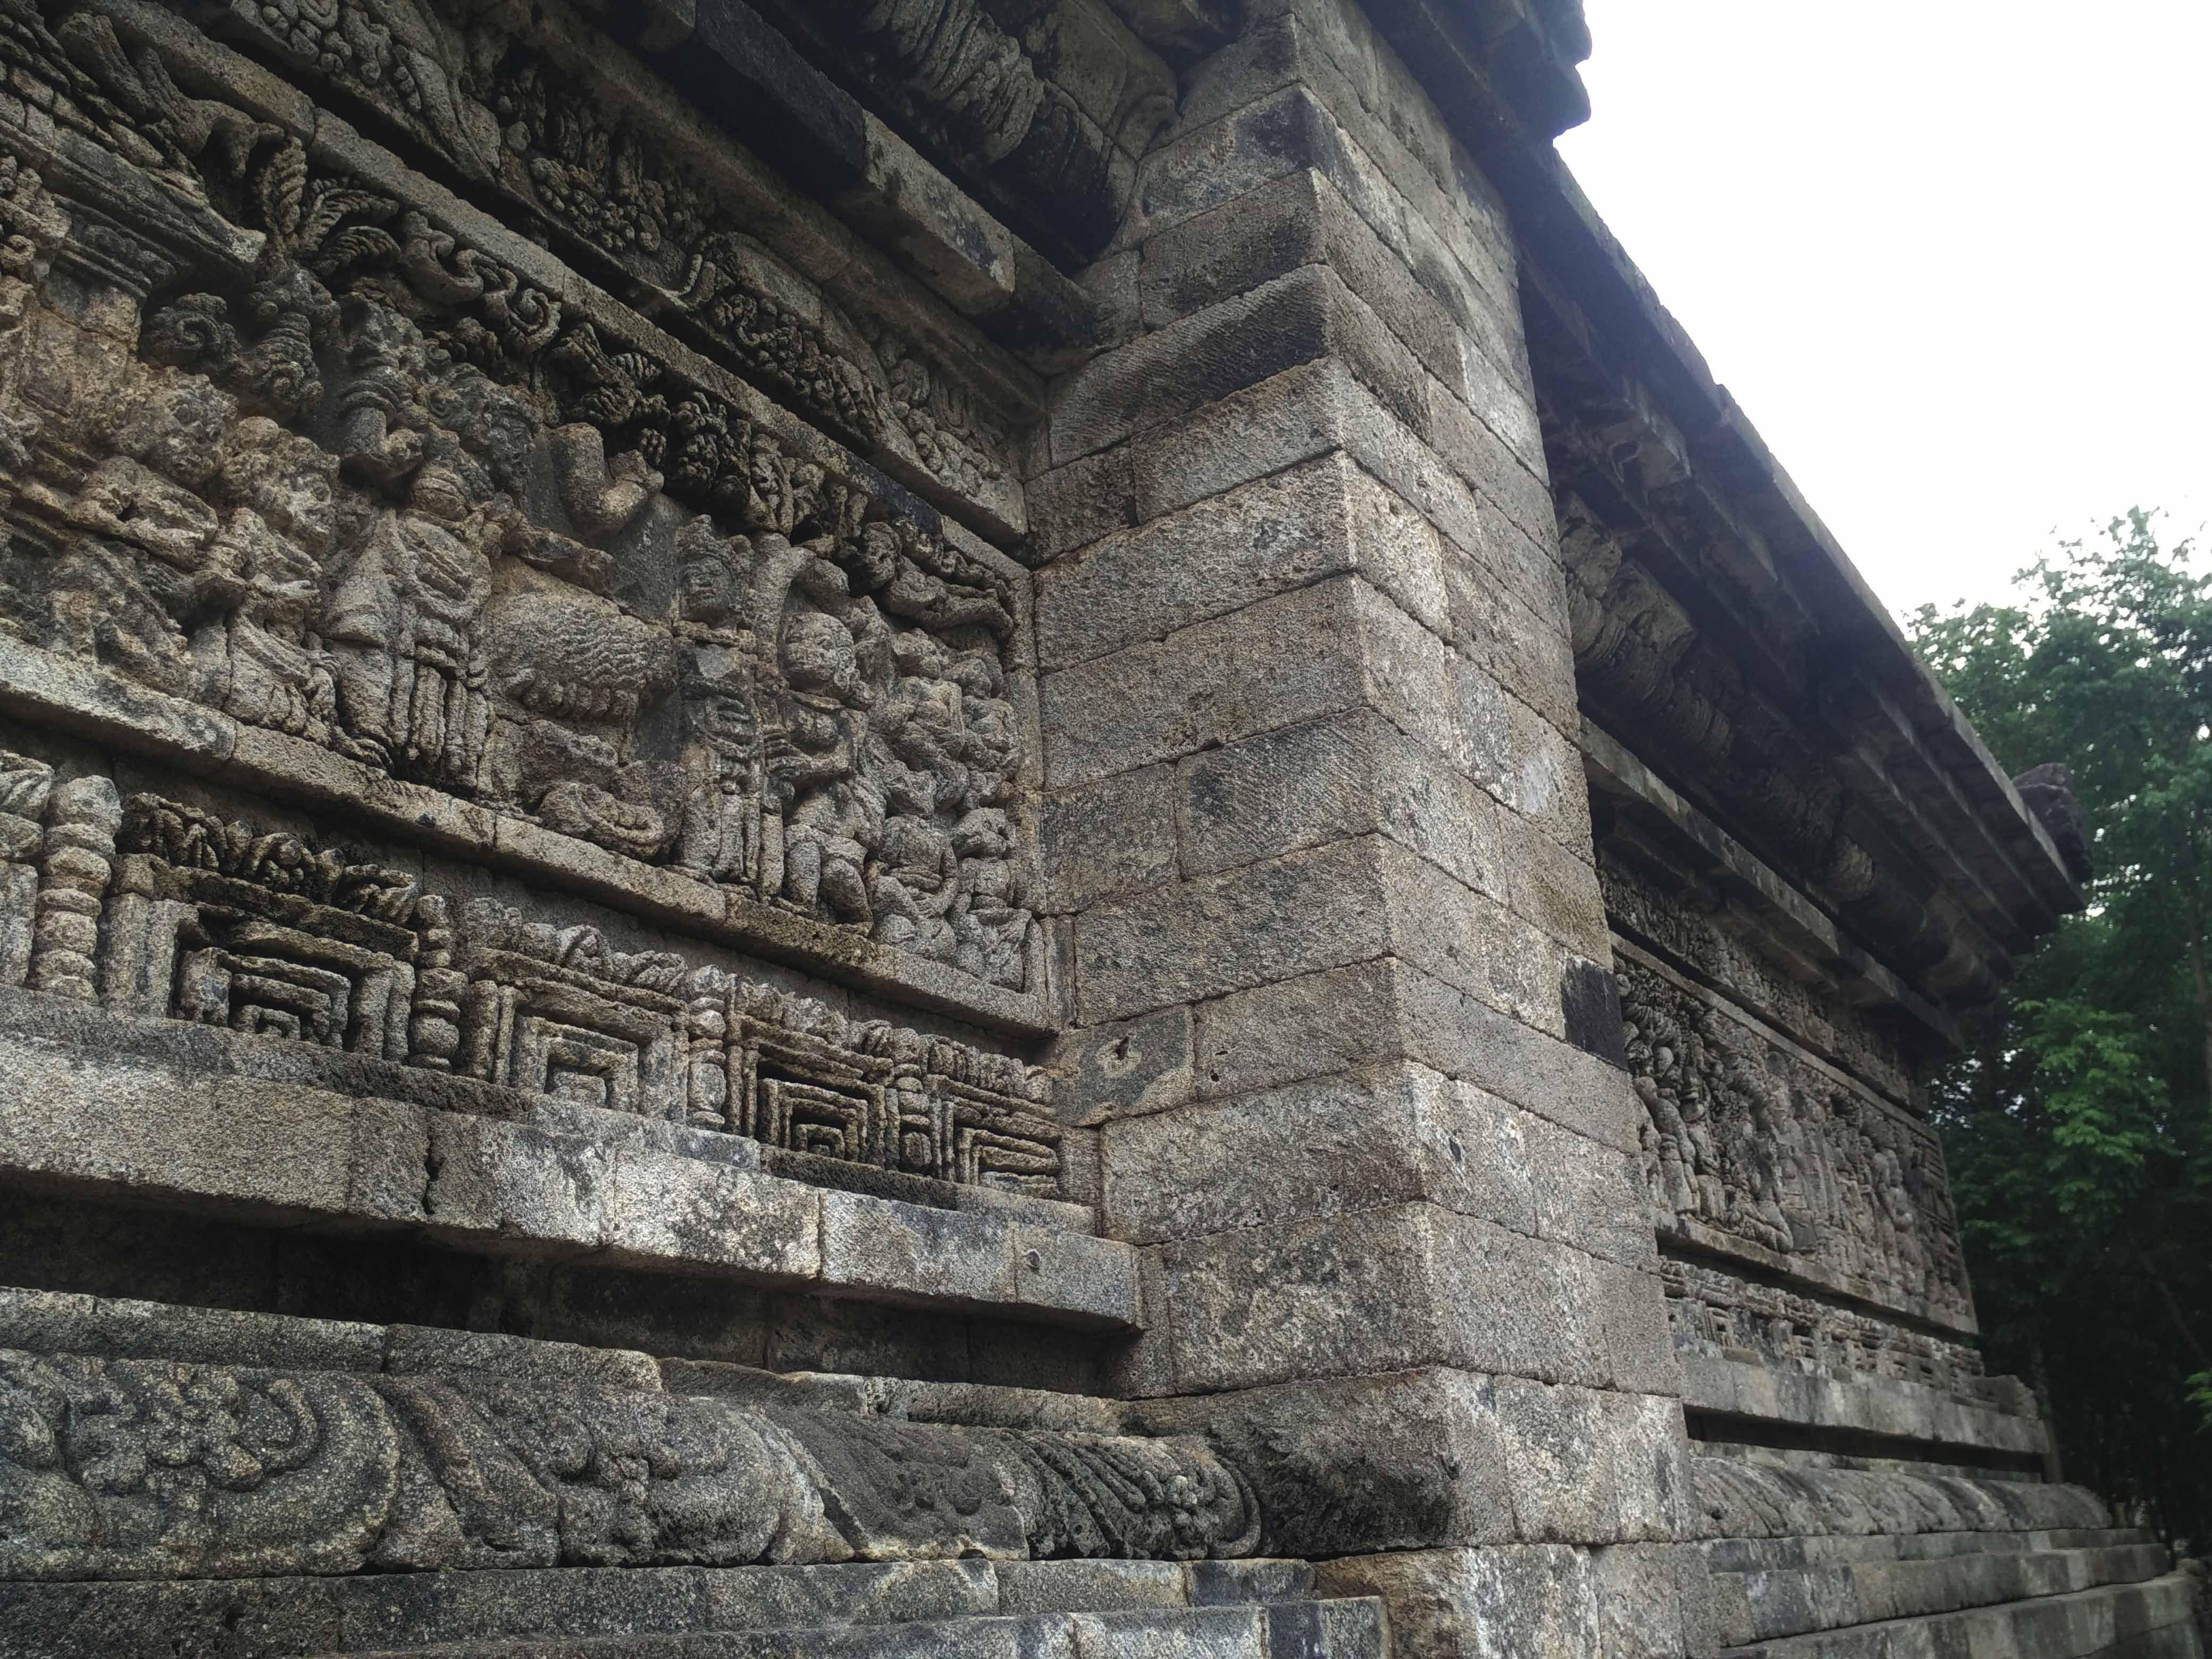 Relief cerita Sudamala yang tertuang pada salah satu sisi Candi Tegowangi (foto: Luana Yunaneva)